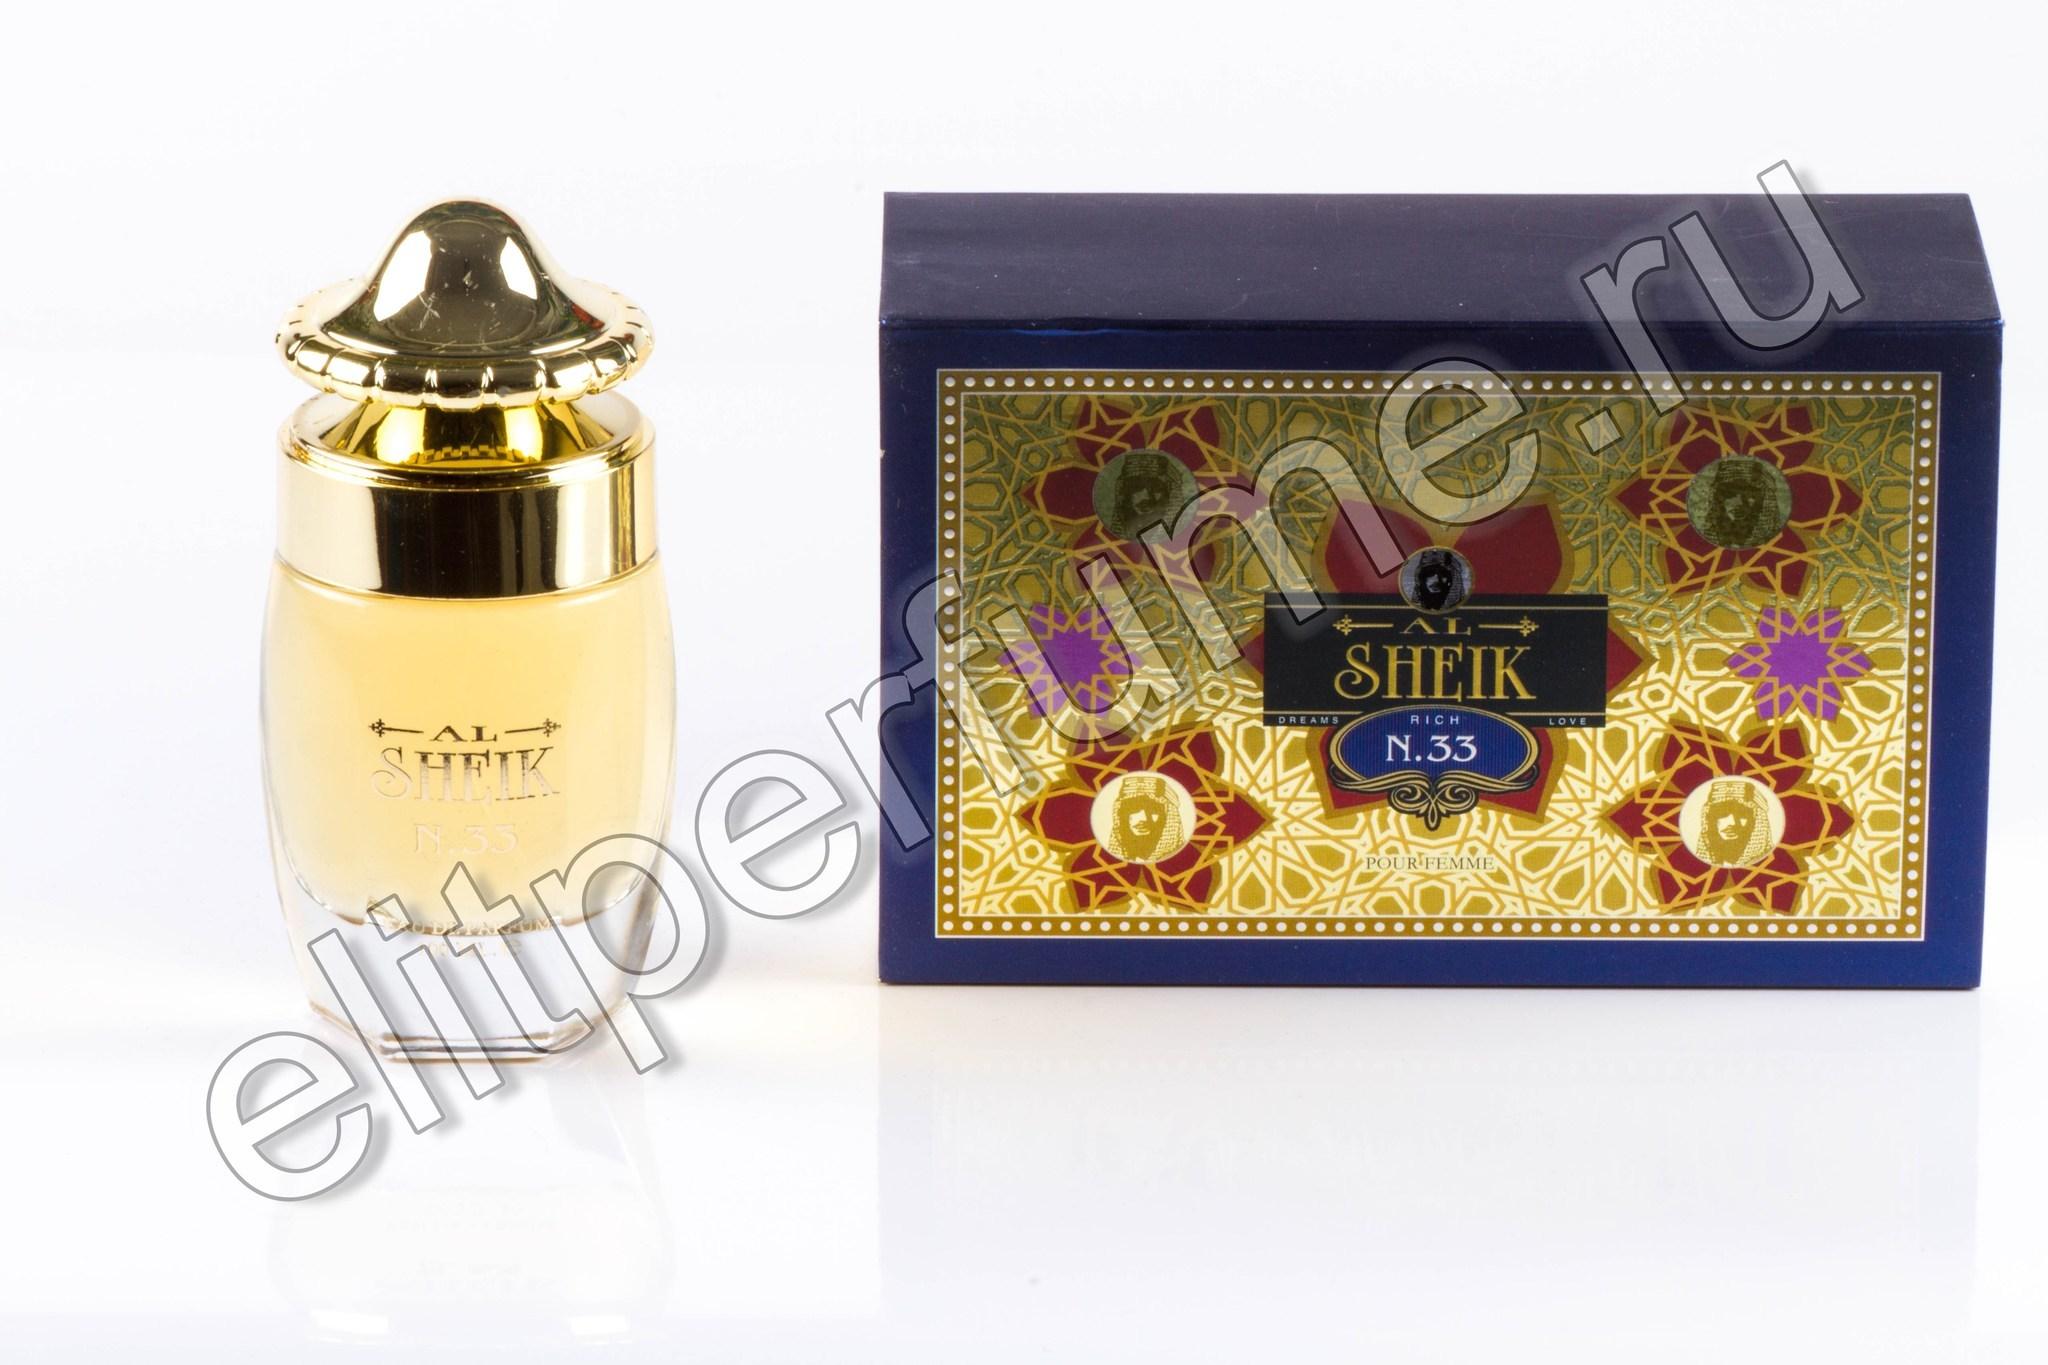 Пробники для Al Sheik 33 Аль Шейх 33 1 мл спрей от Фрагранс Ворлд Fragrance world